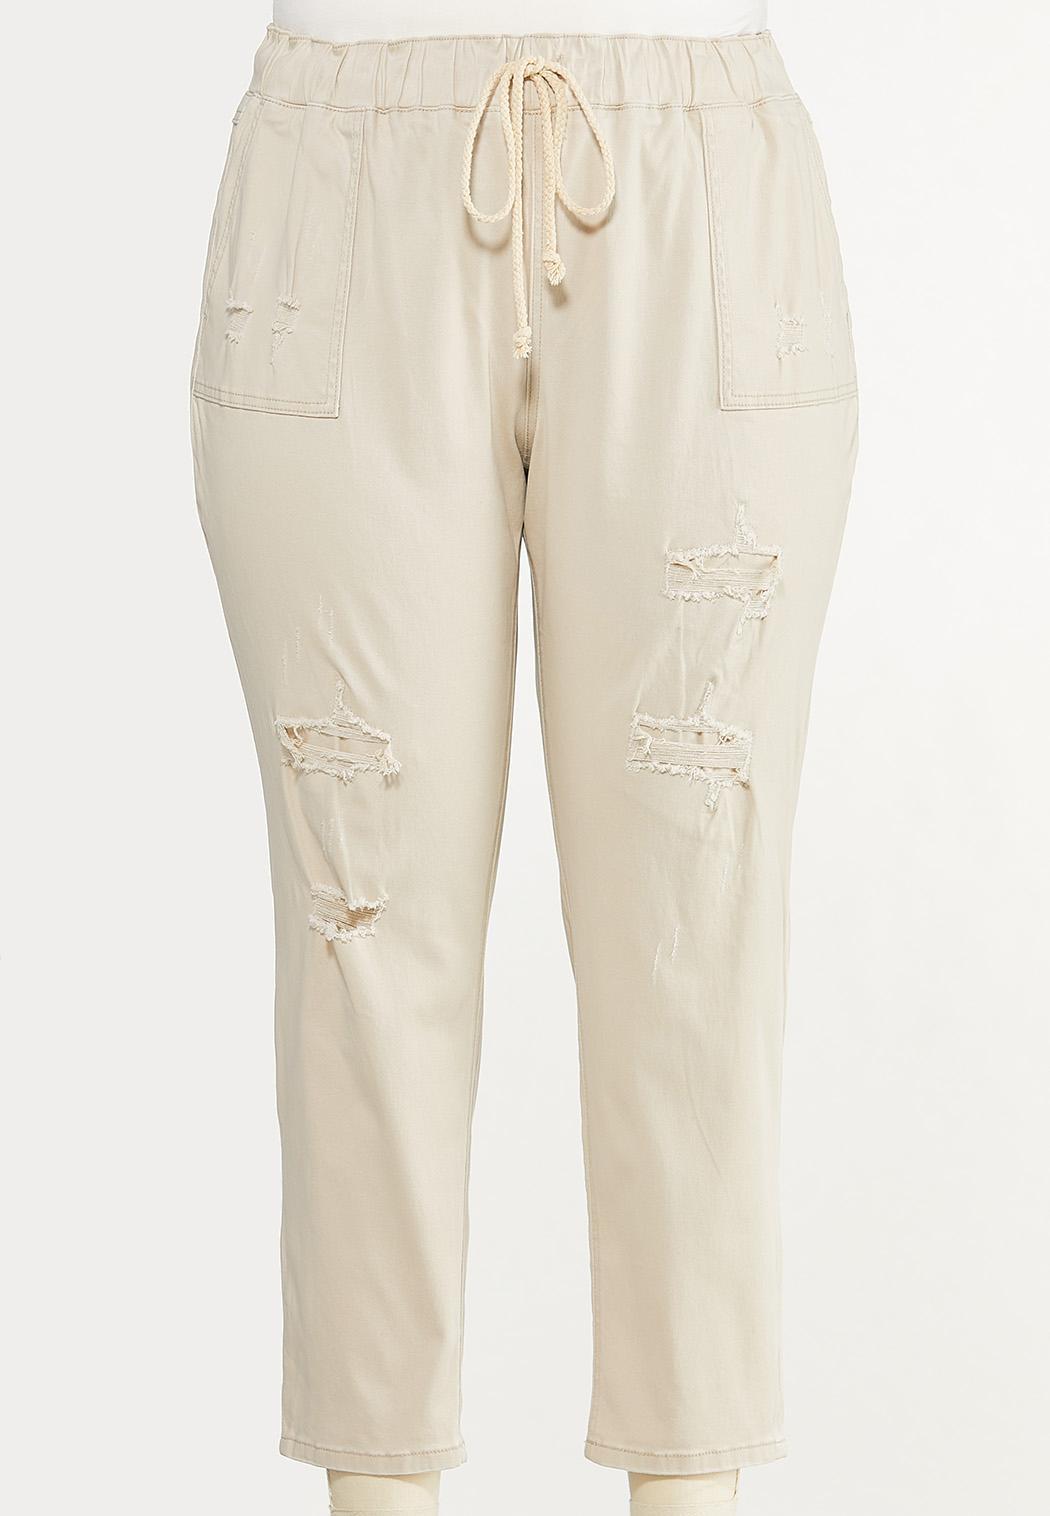 Plus Size Khaki Twill Pants